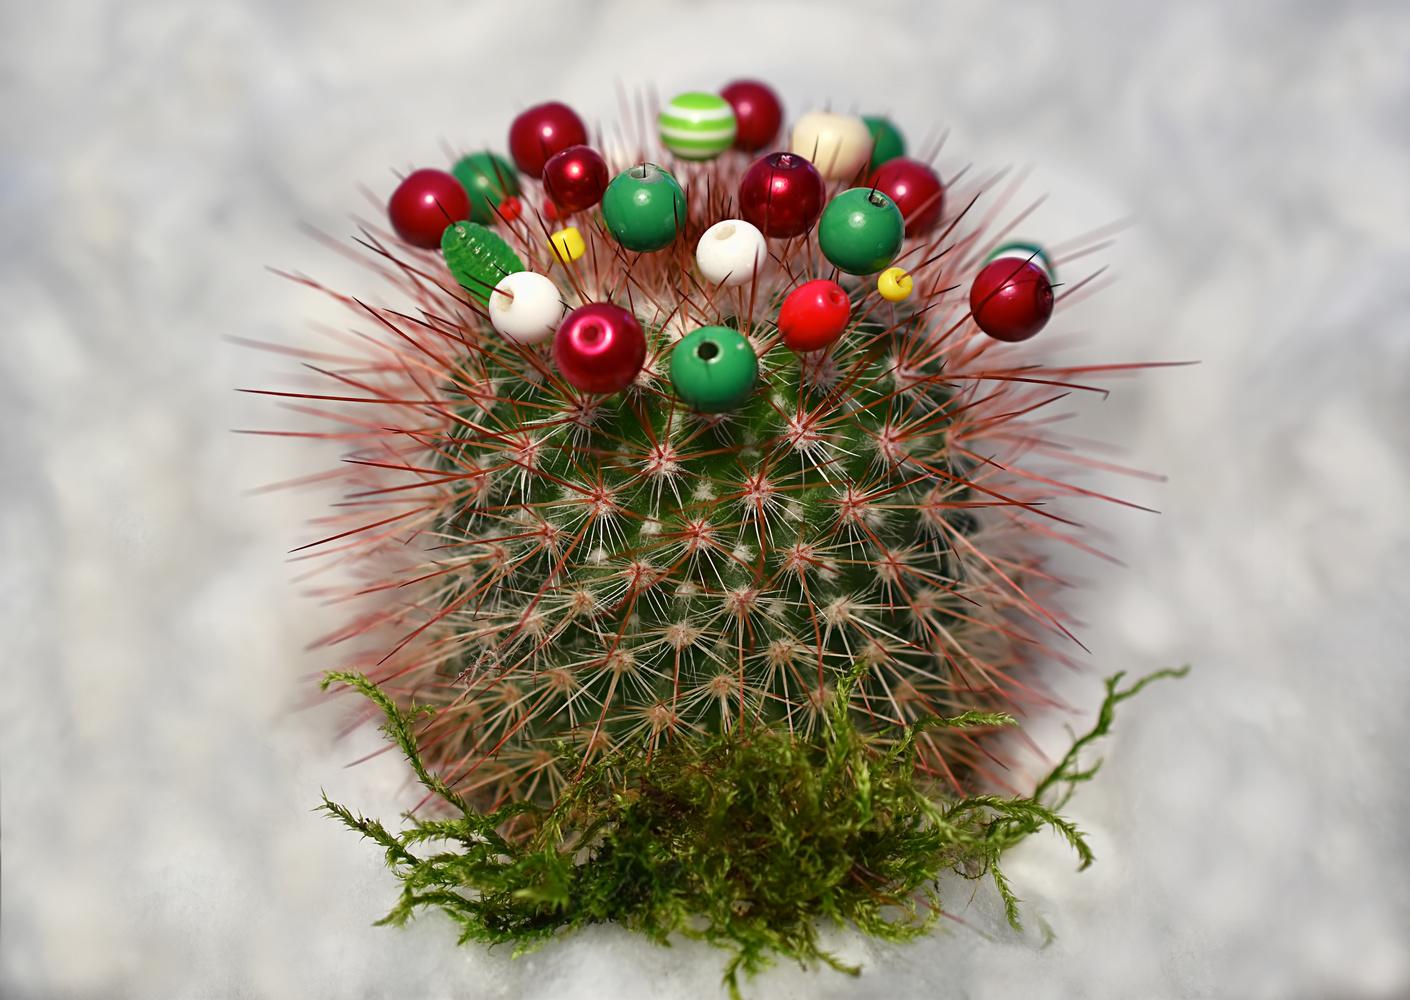 A thorny year by Sandra McCabe